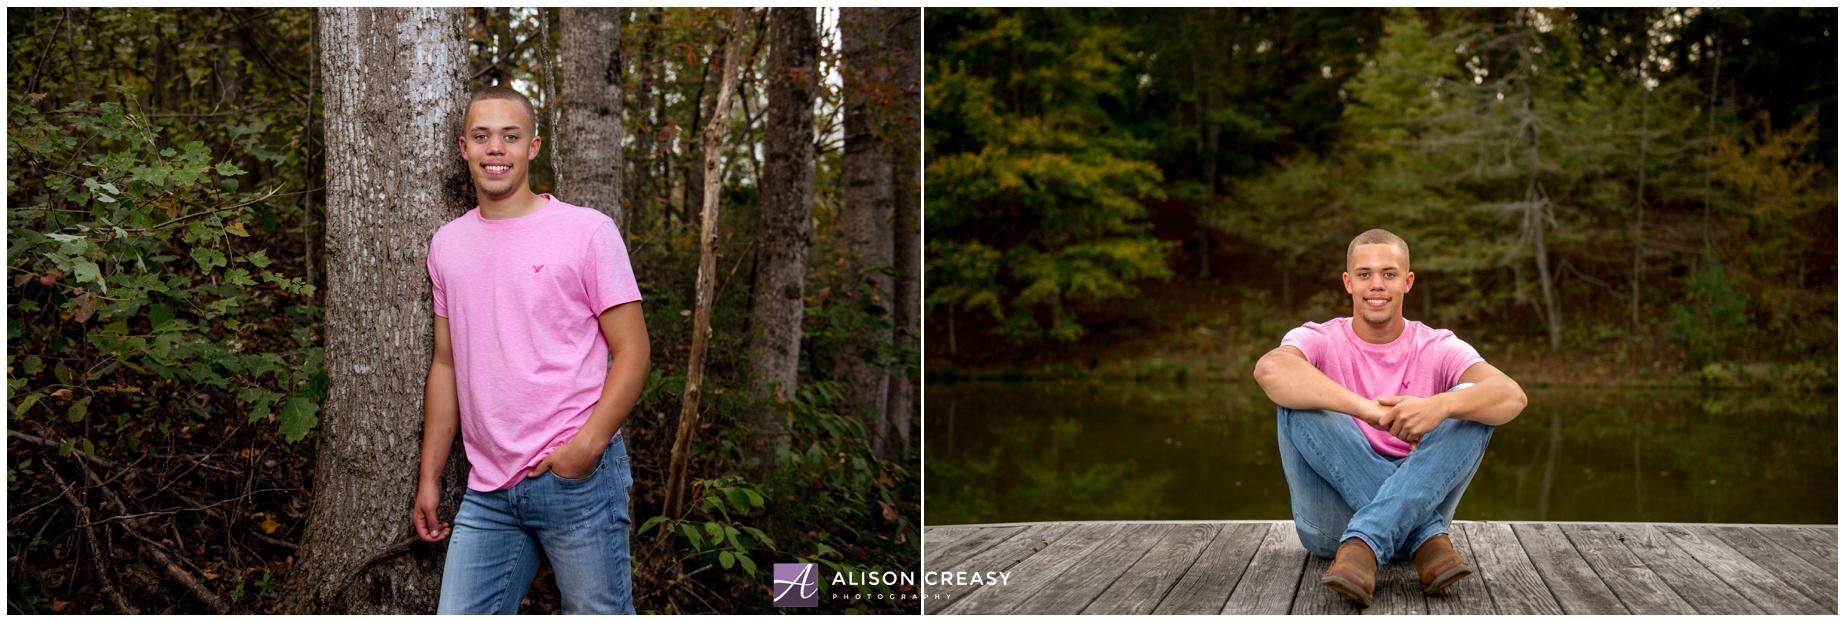 Alison-Creasy-Photography-Lynchburg-VA-Photographer_0918.jpg